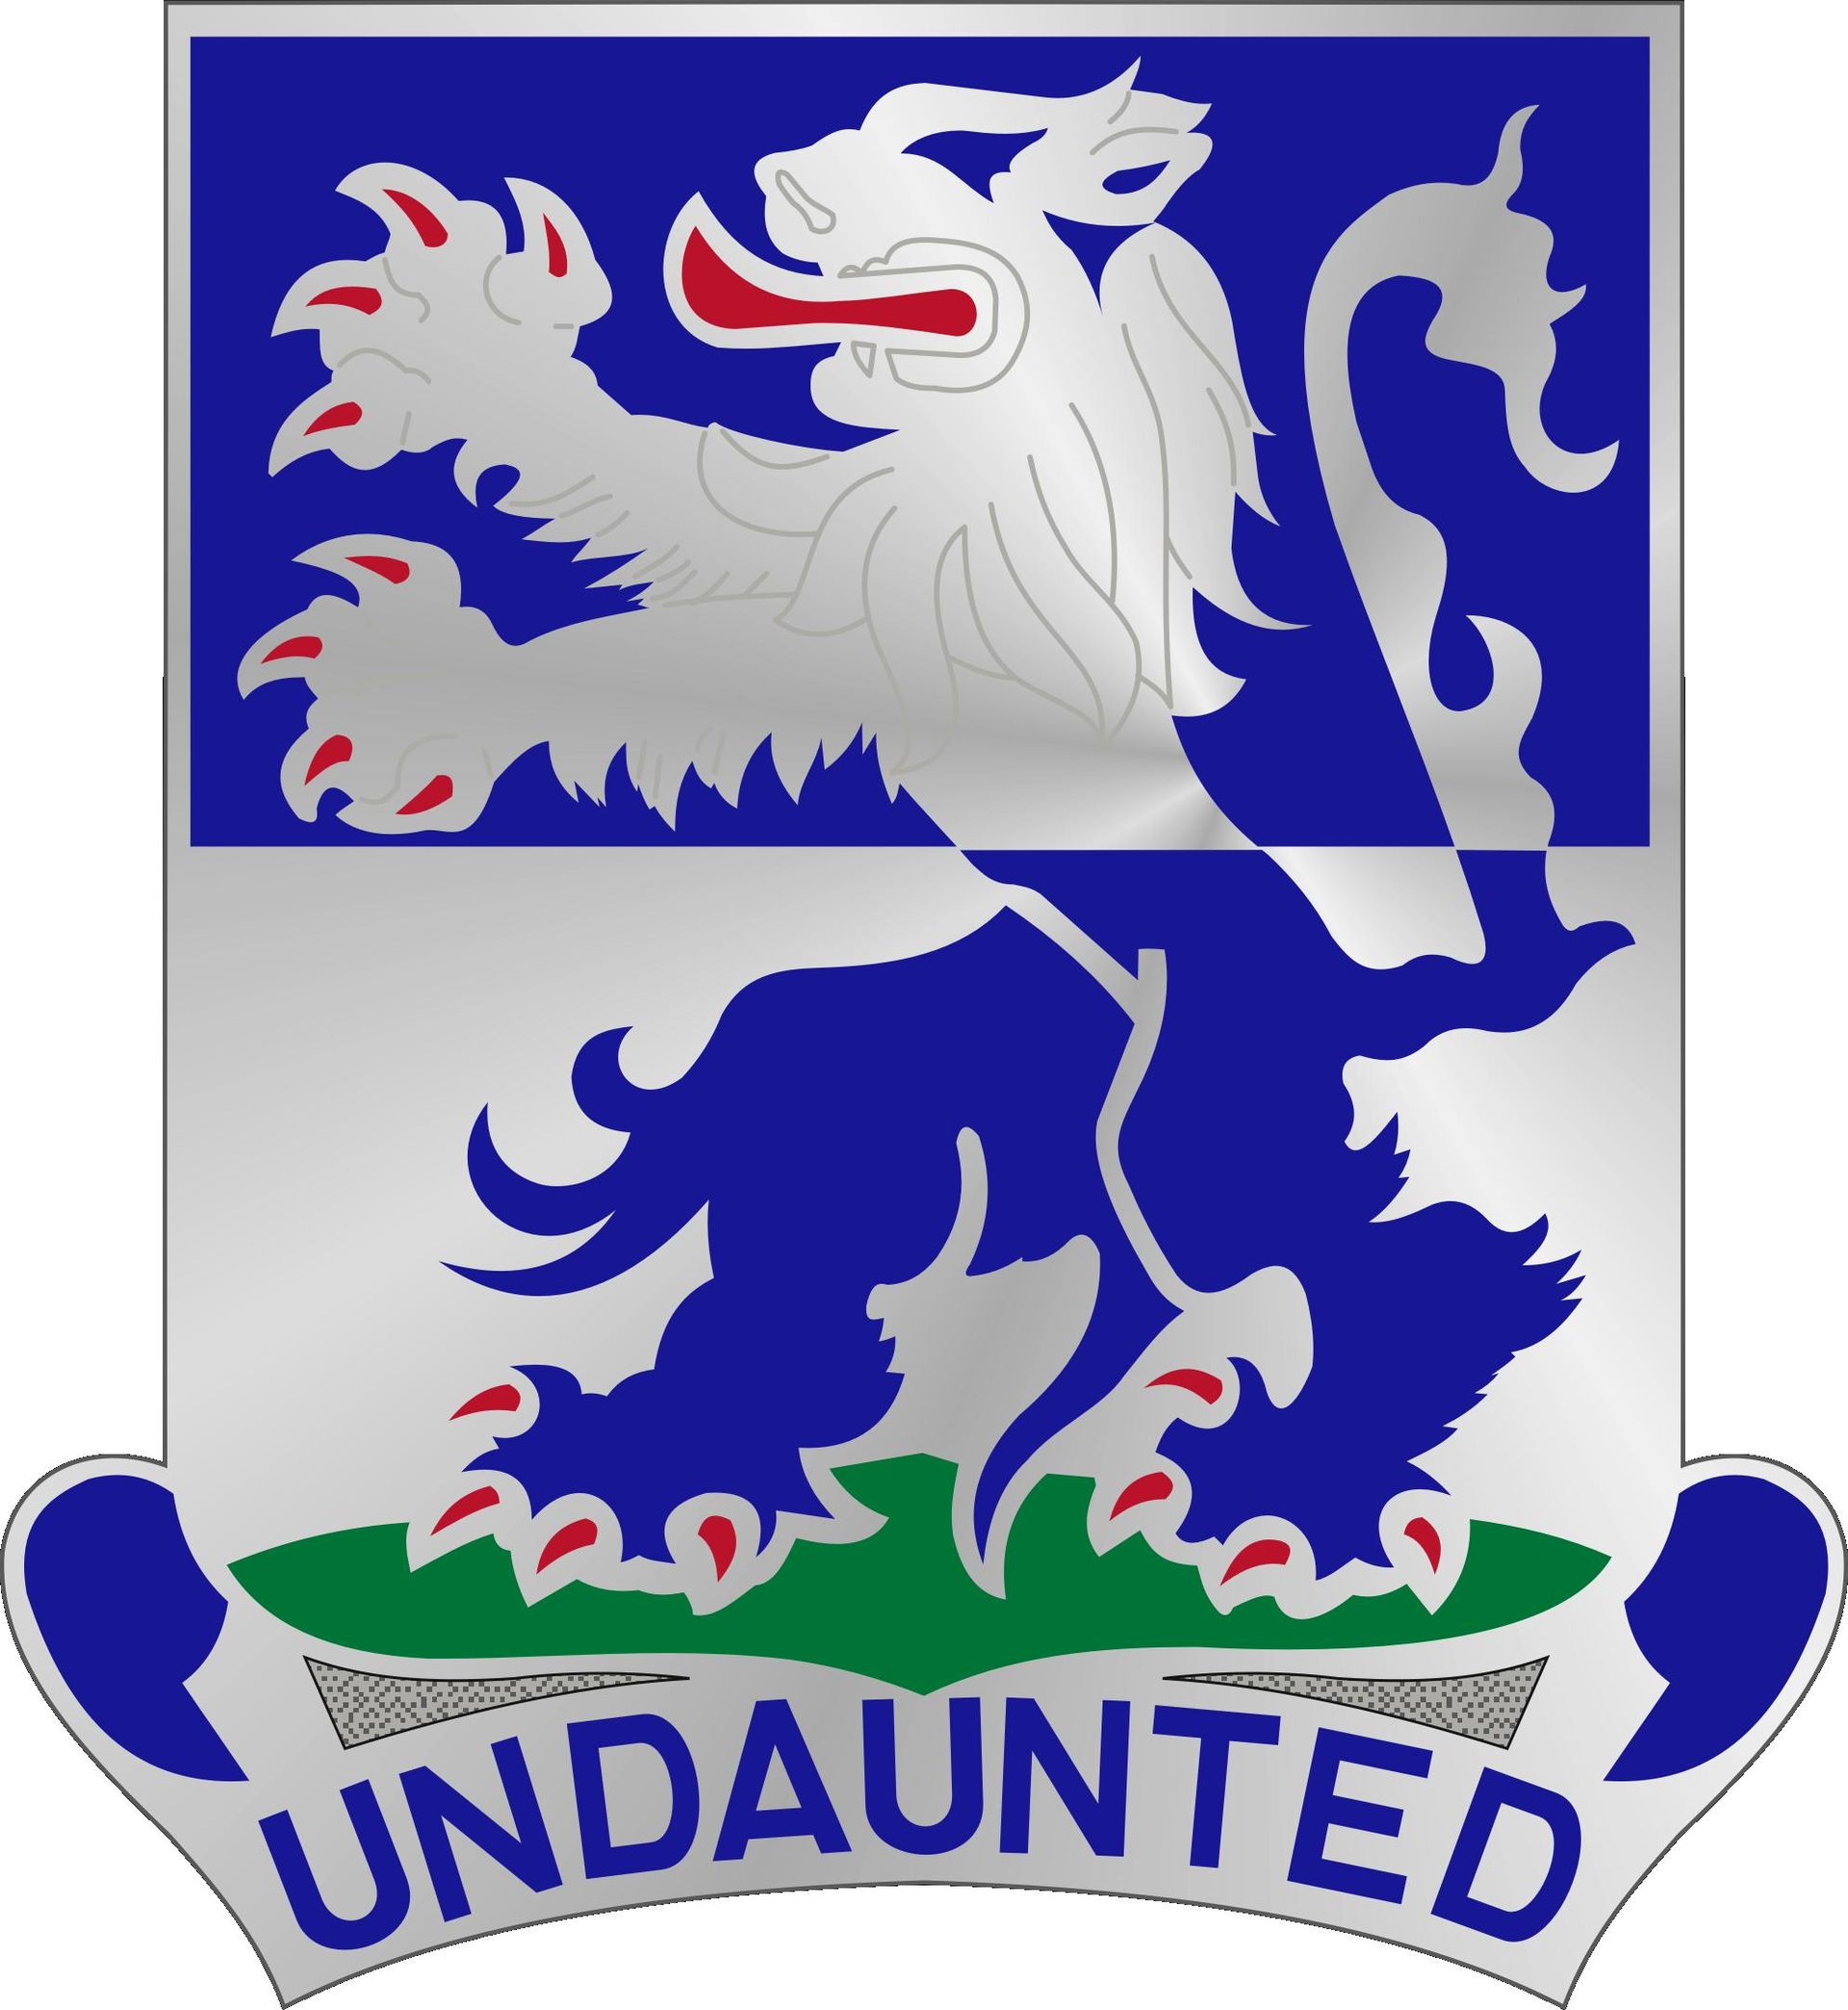 183rd Infantry Regiment (United States)